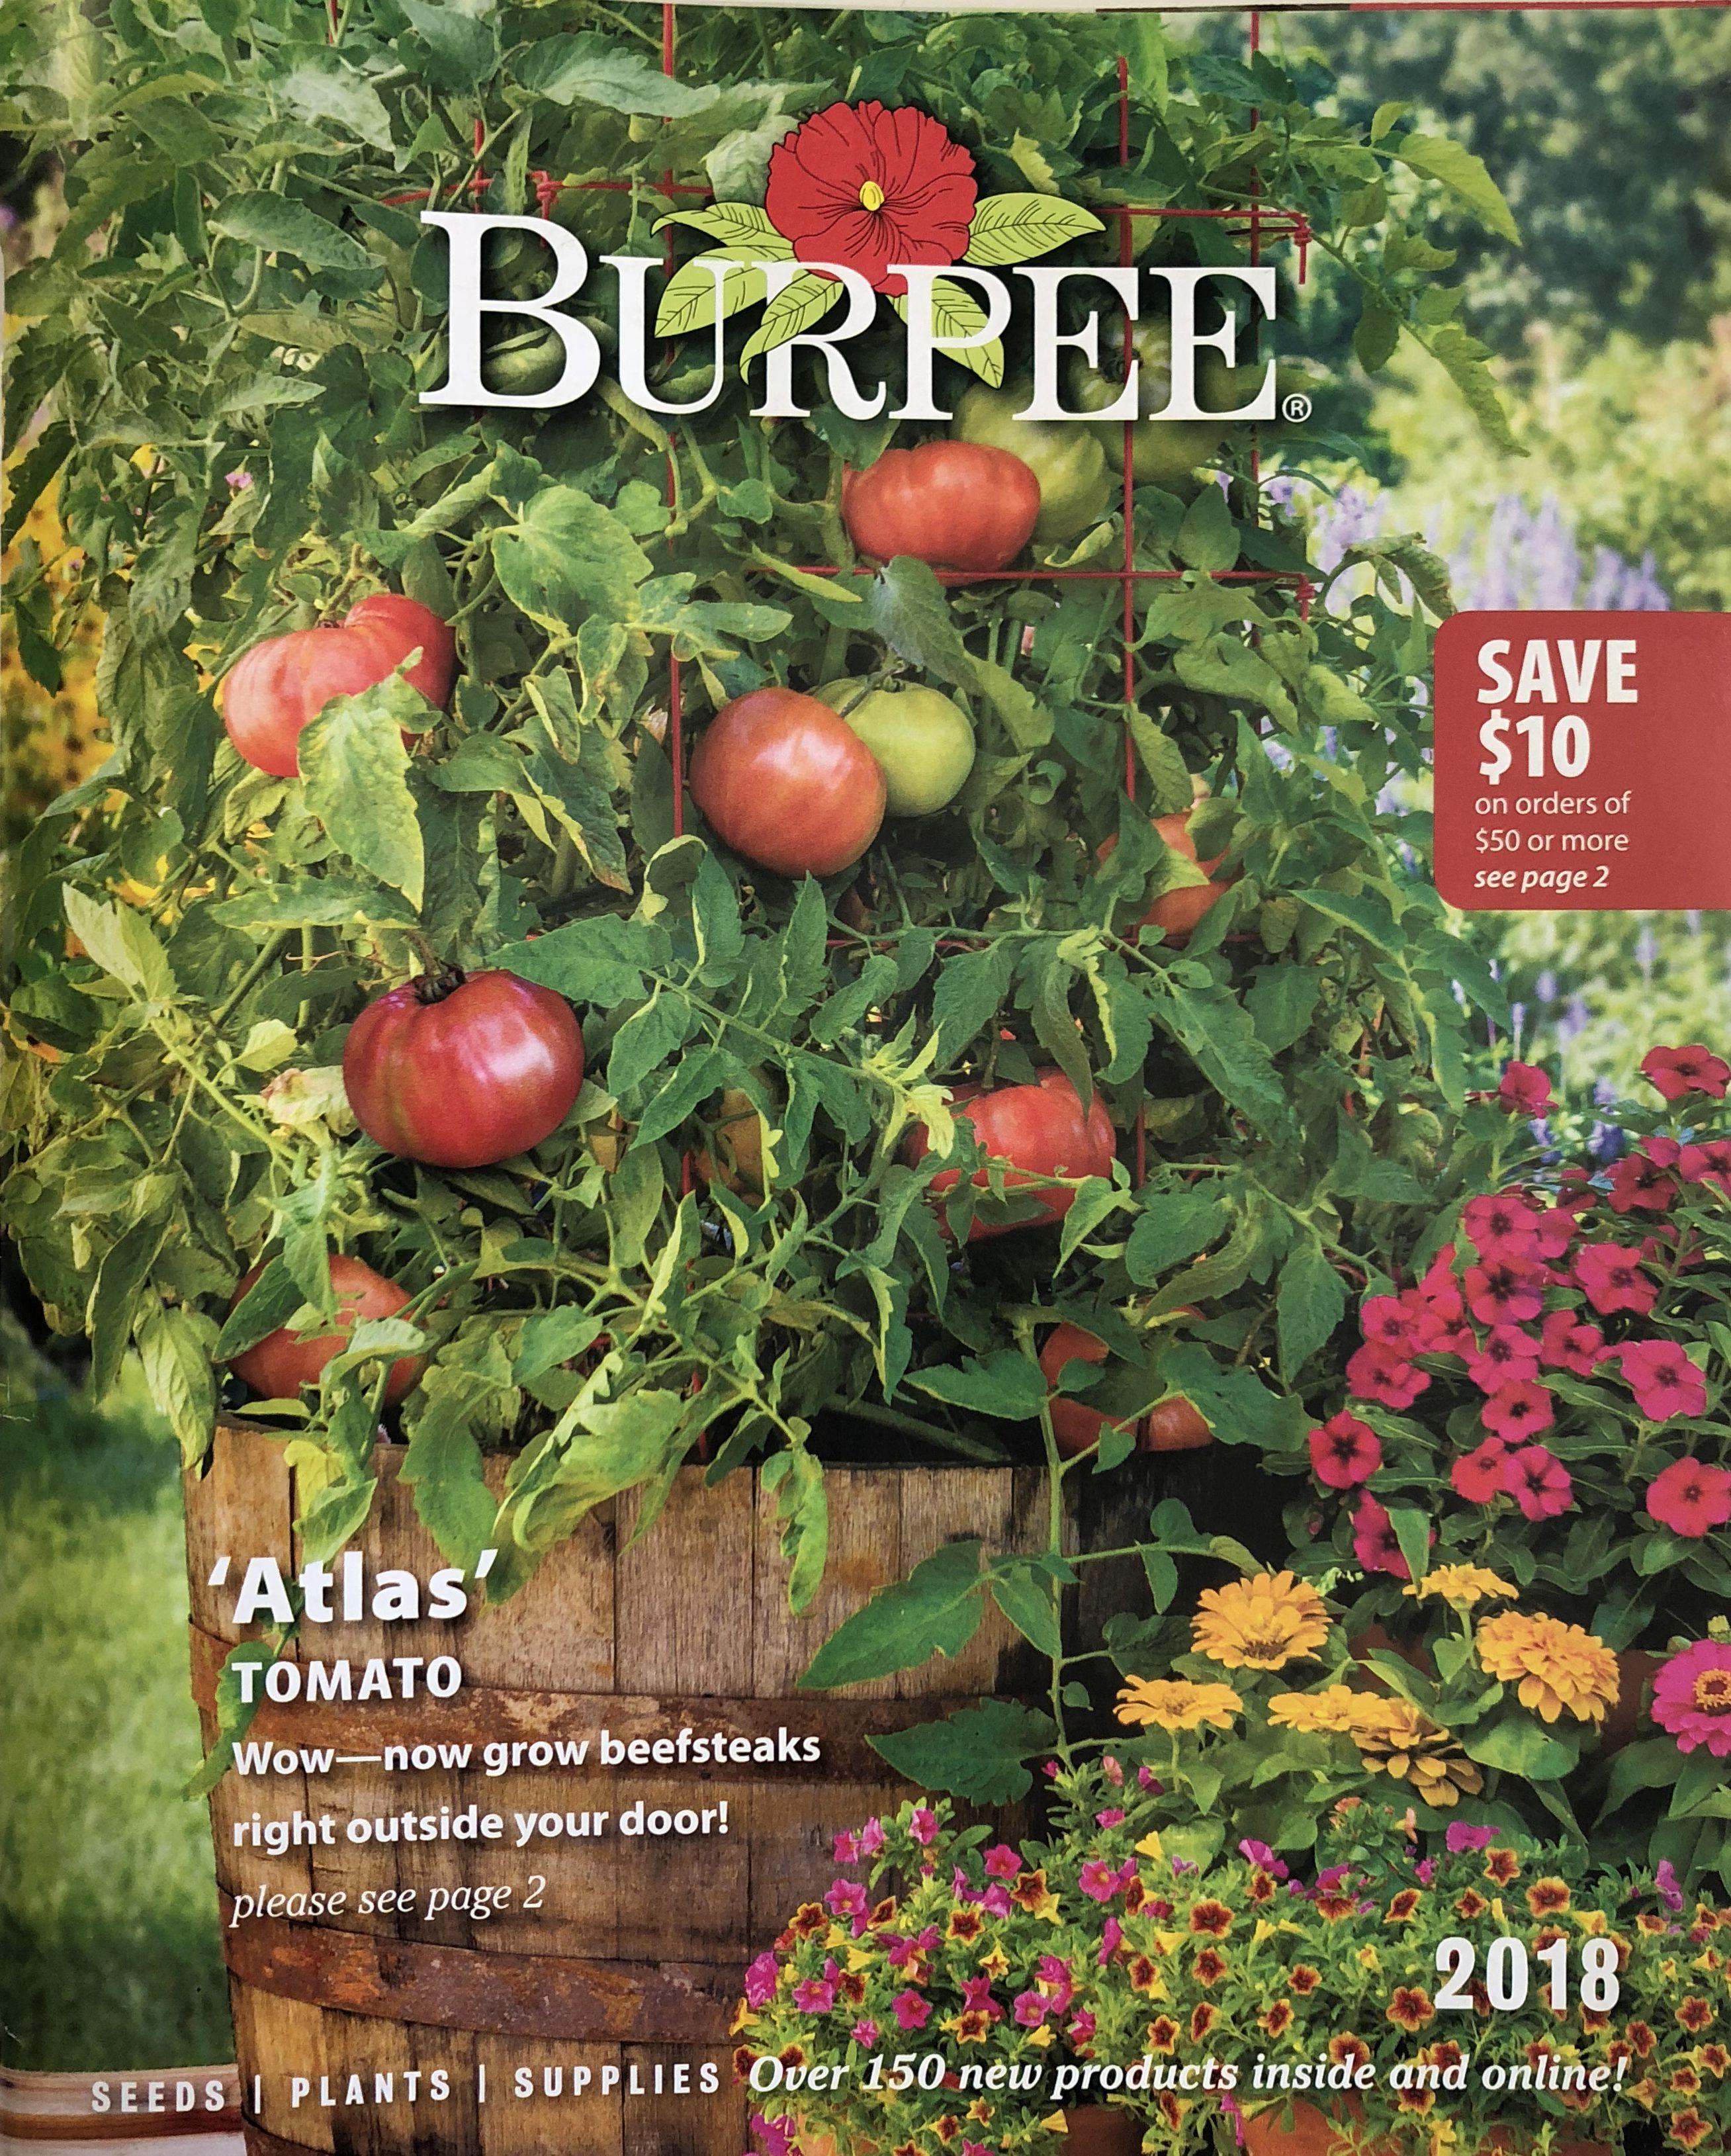 The 2018 Burpee seed catalog